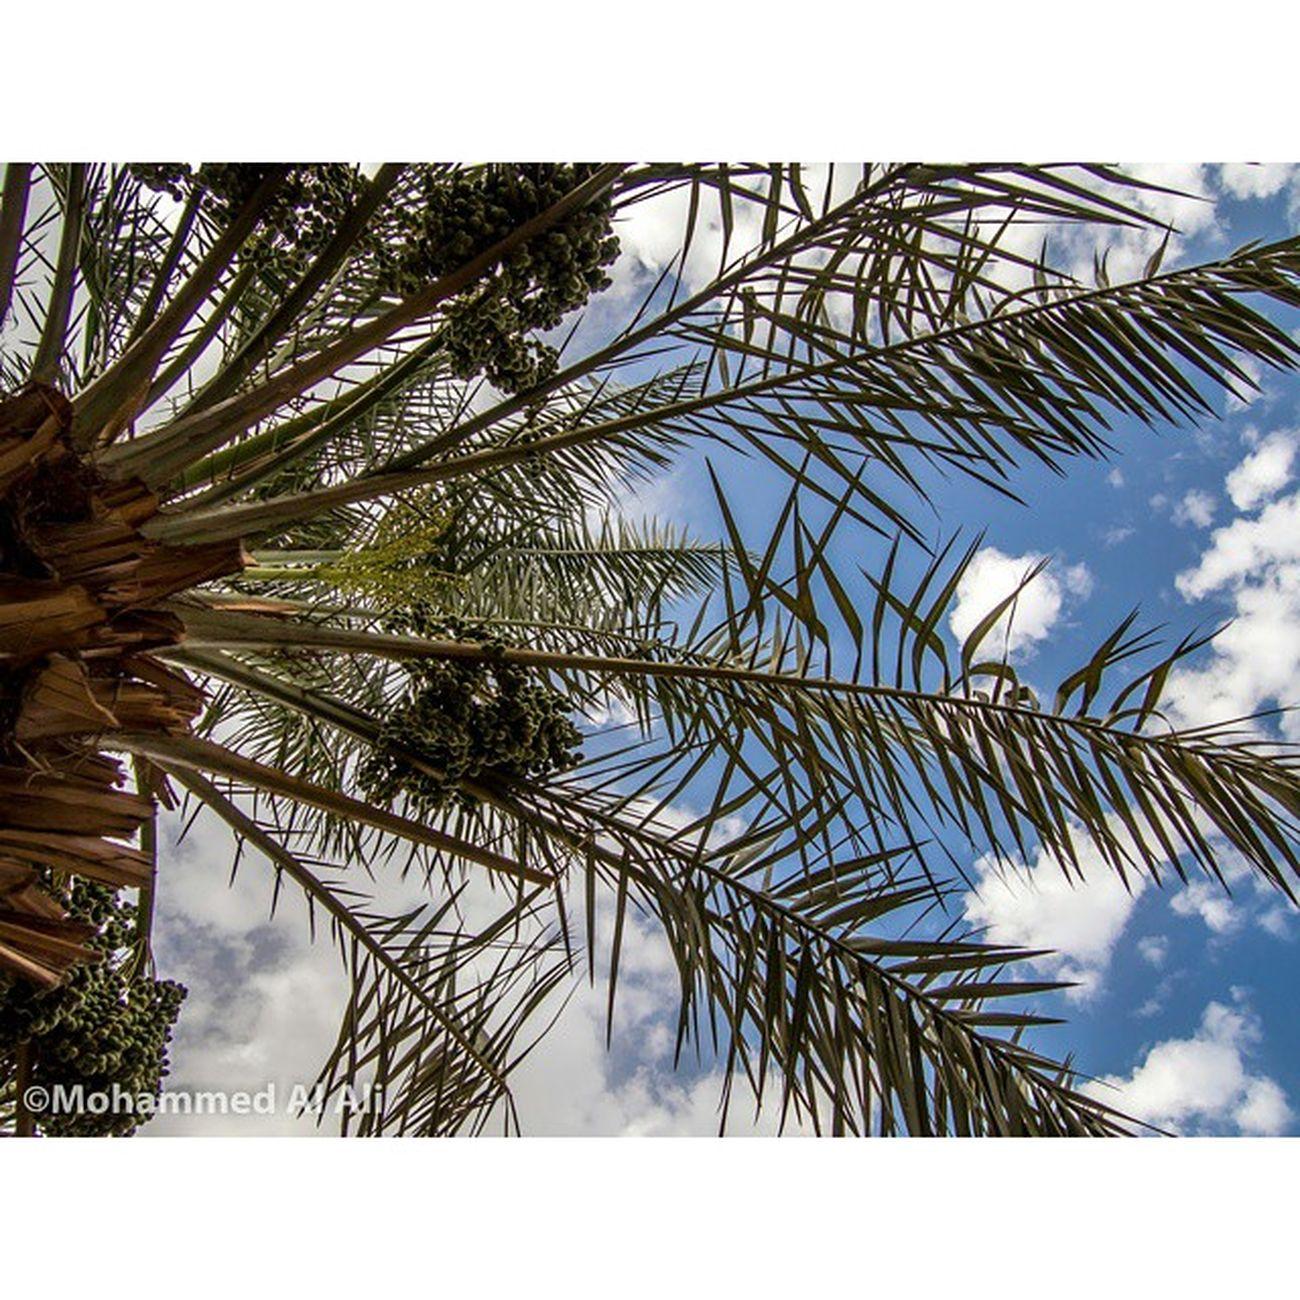 Olympus OlympusPEN PL7 20mm 1 .7 Lens Lumix Macro Micro_four_third Color Blur Palm Basrah Iraq Mft Wood Shadow Sky Creative Clouds